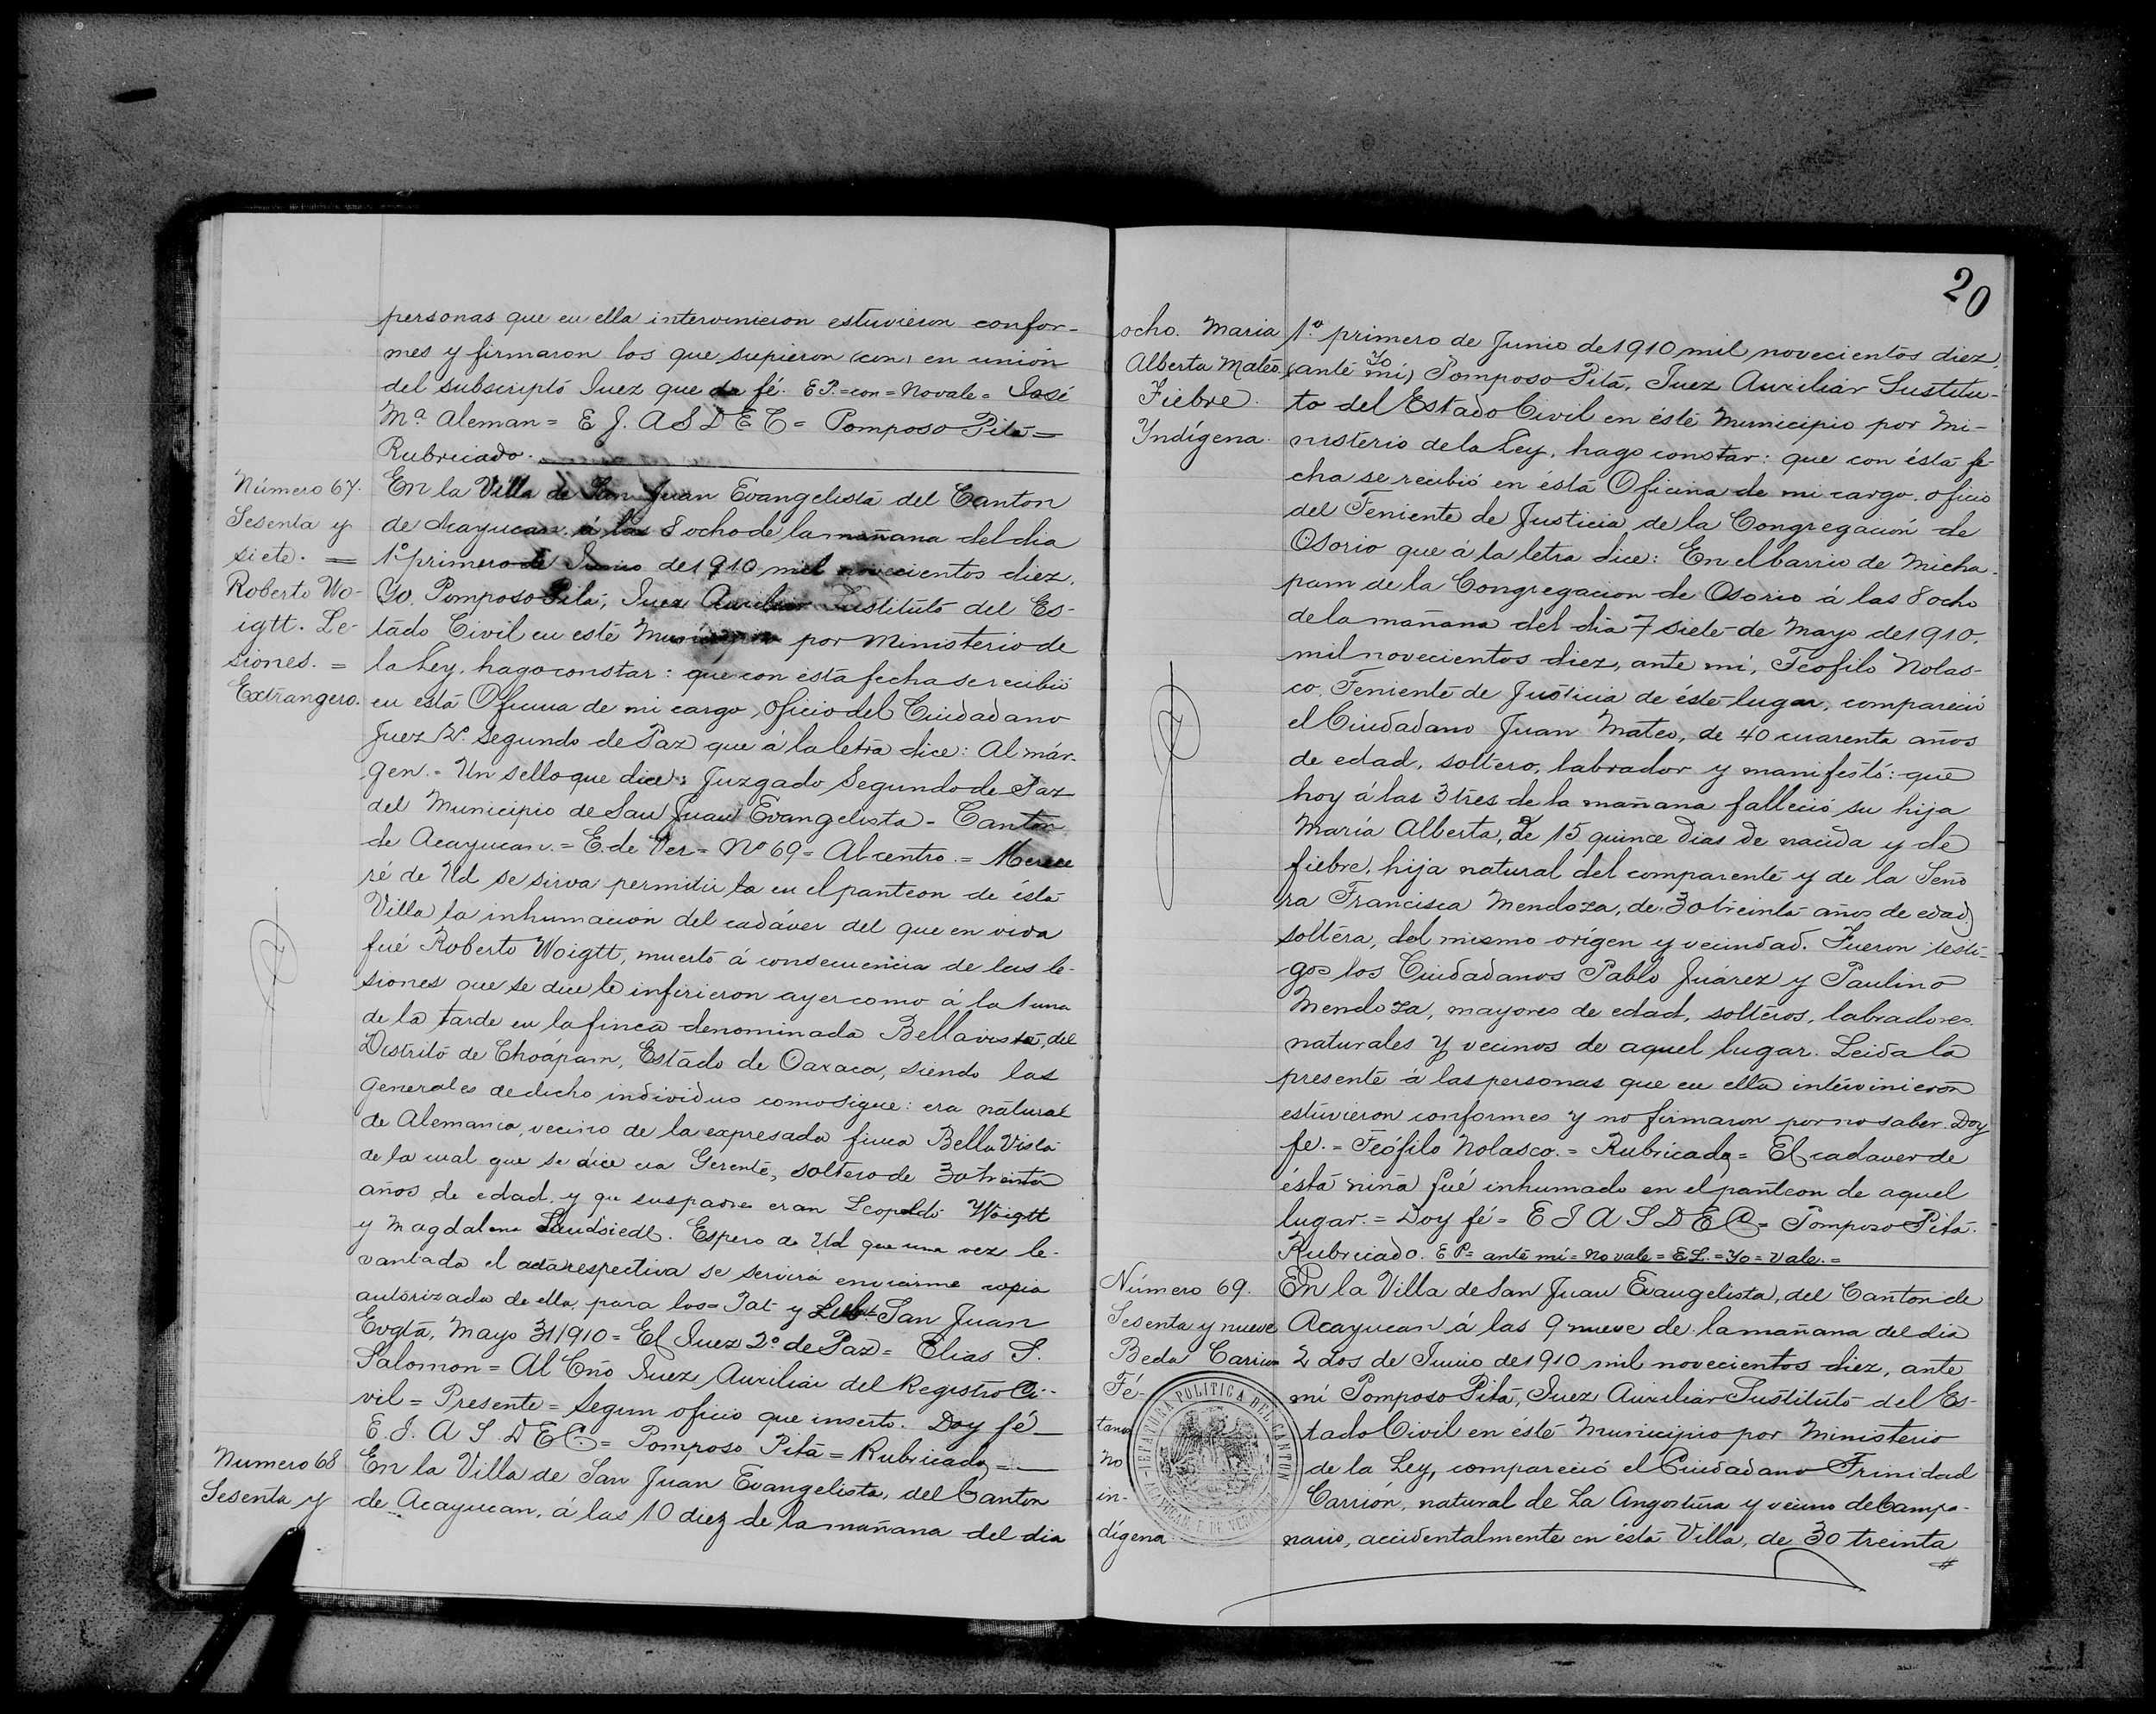 Civil Death Registration, San Juan Evangelisa, Veracruz-Llave, México, 1910